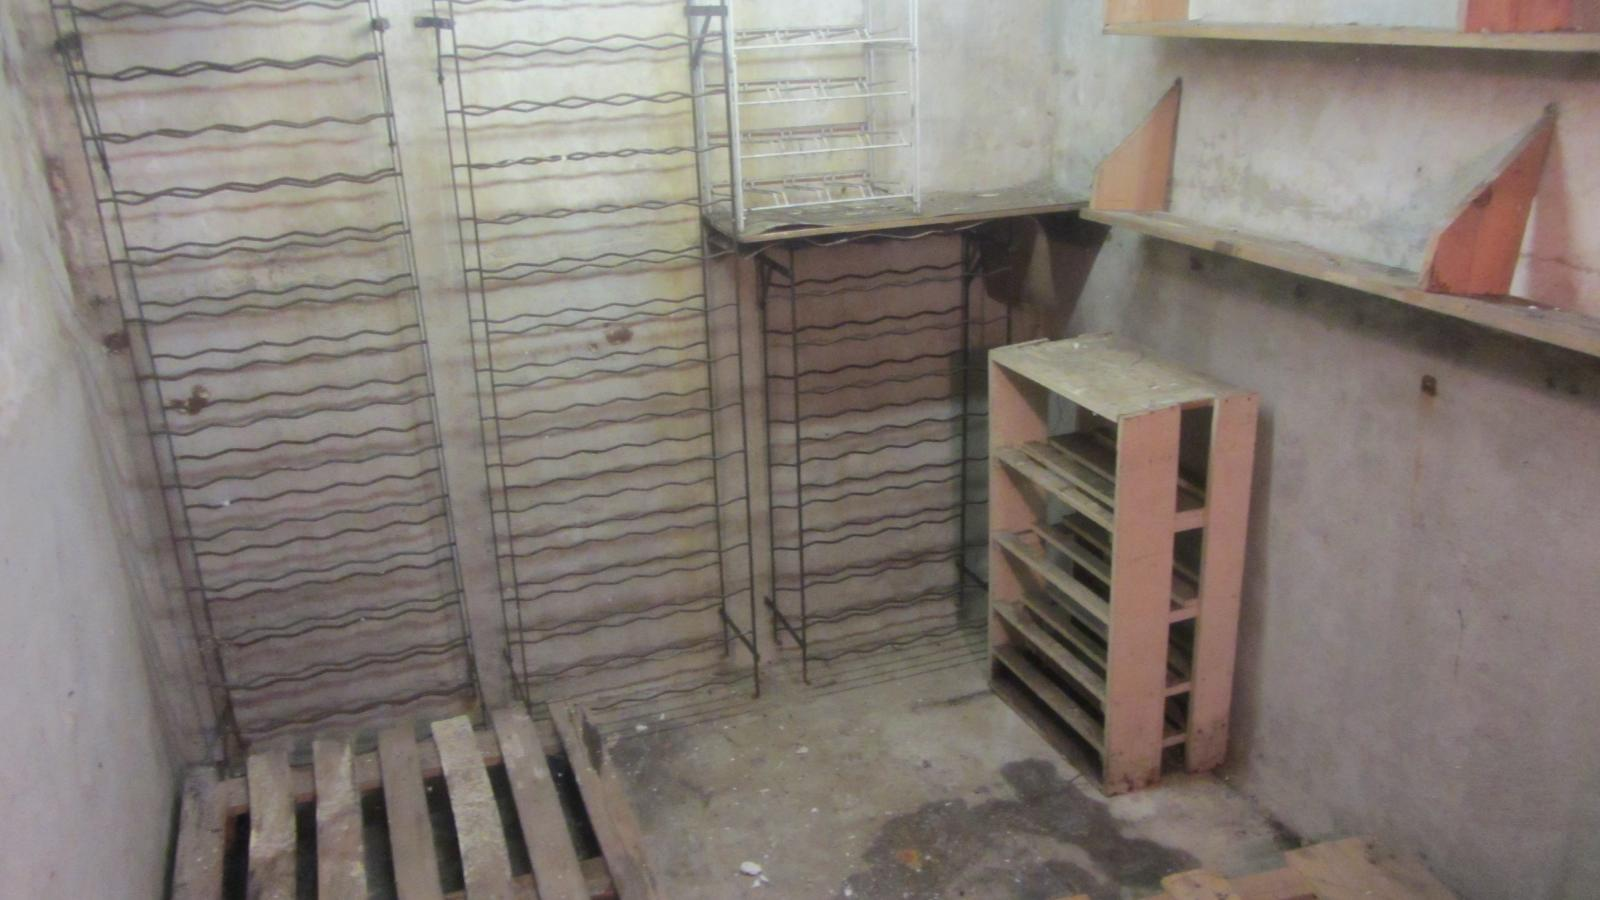 am nager une cave 3835 ilot central ikea ilot central ikea cevelle d 233 sign balcon. Black Bedroom Furniture Sets. Home Design Ideas